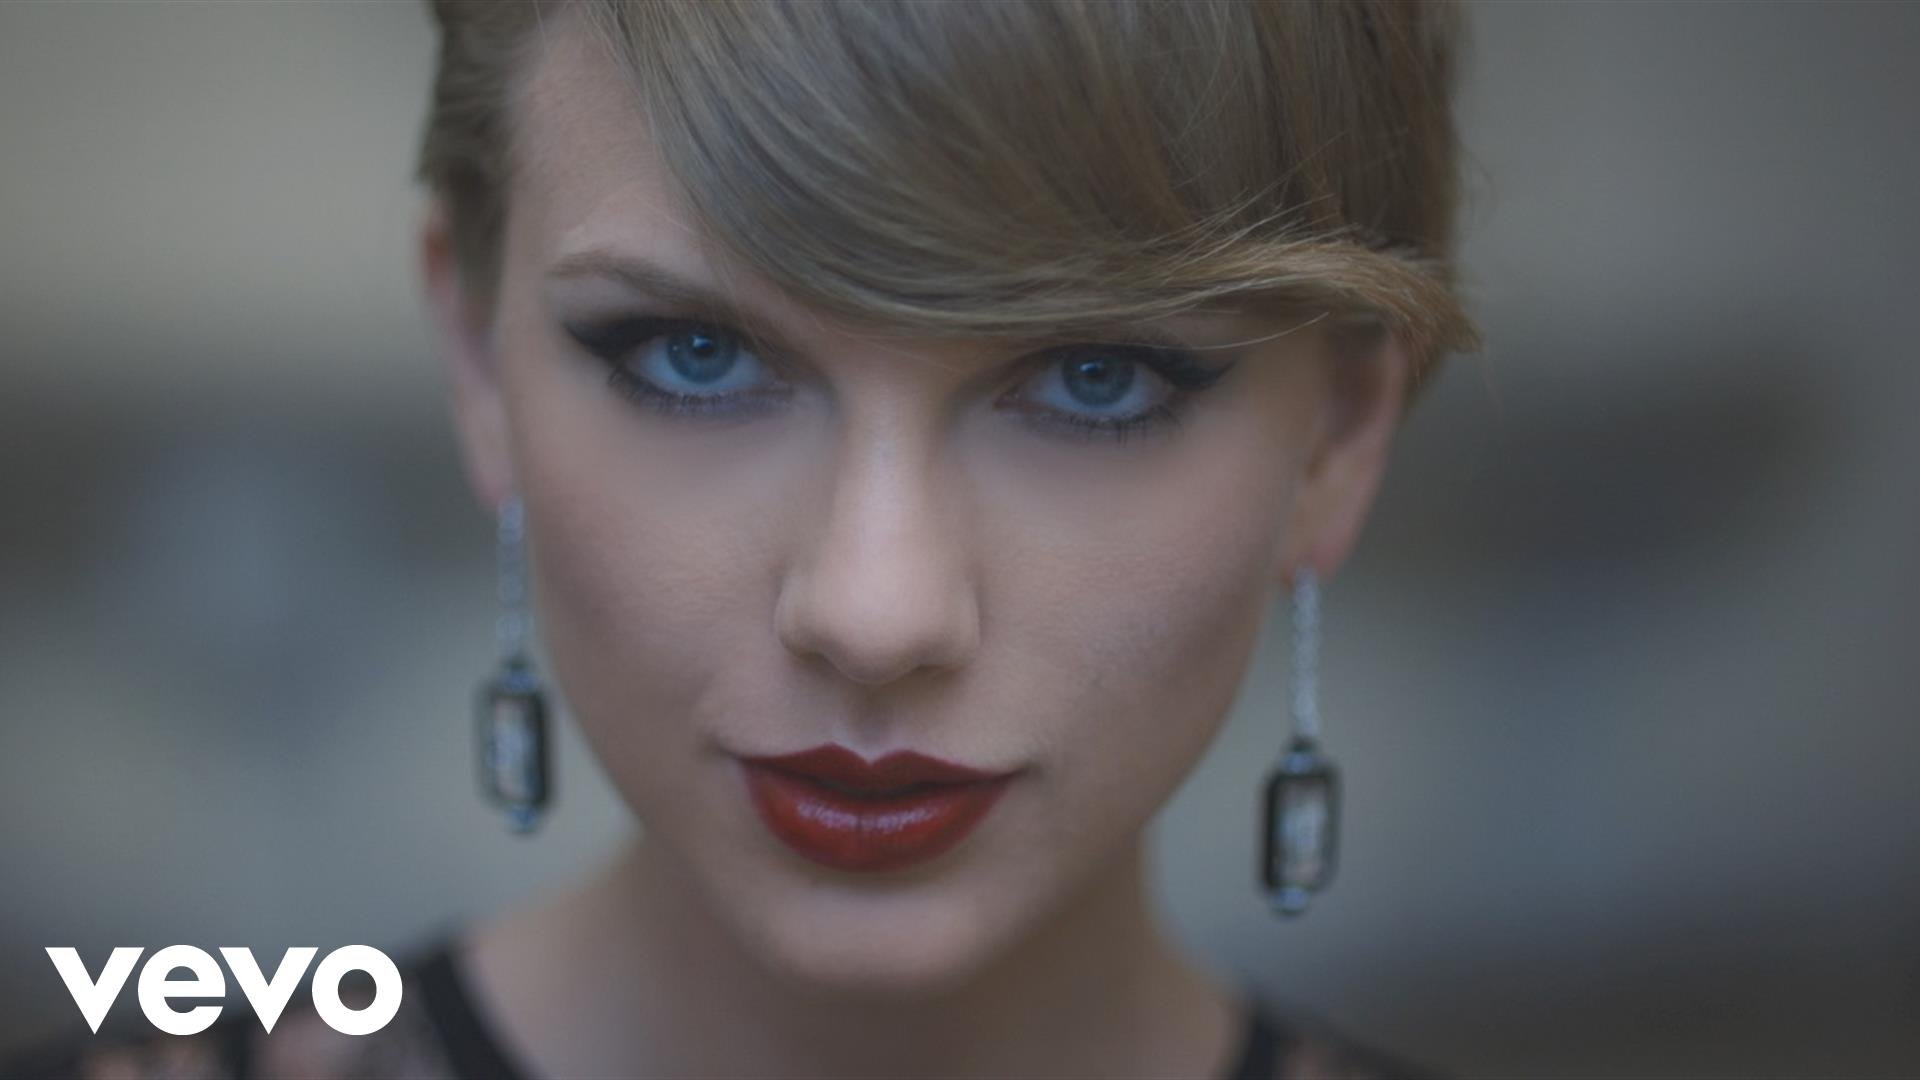 Taylor Swift - Blank Space 1